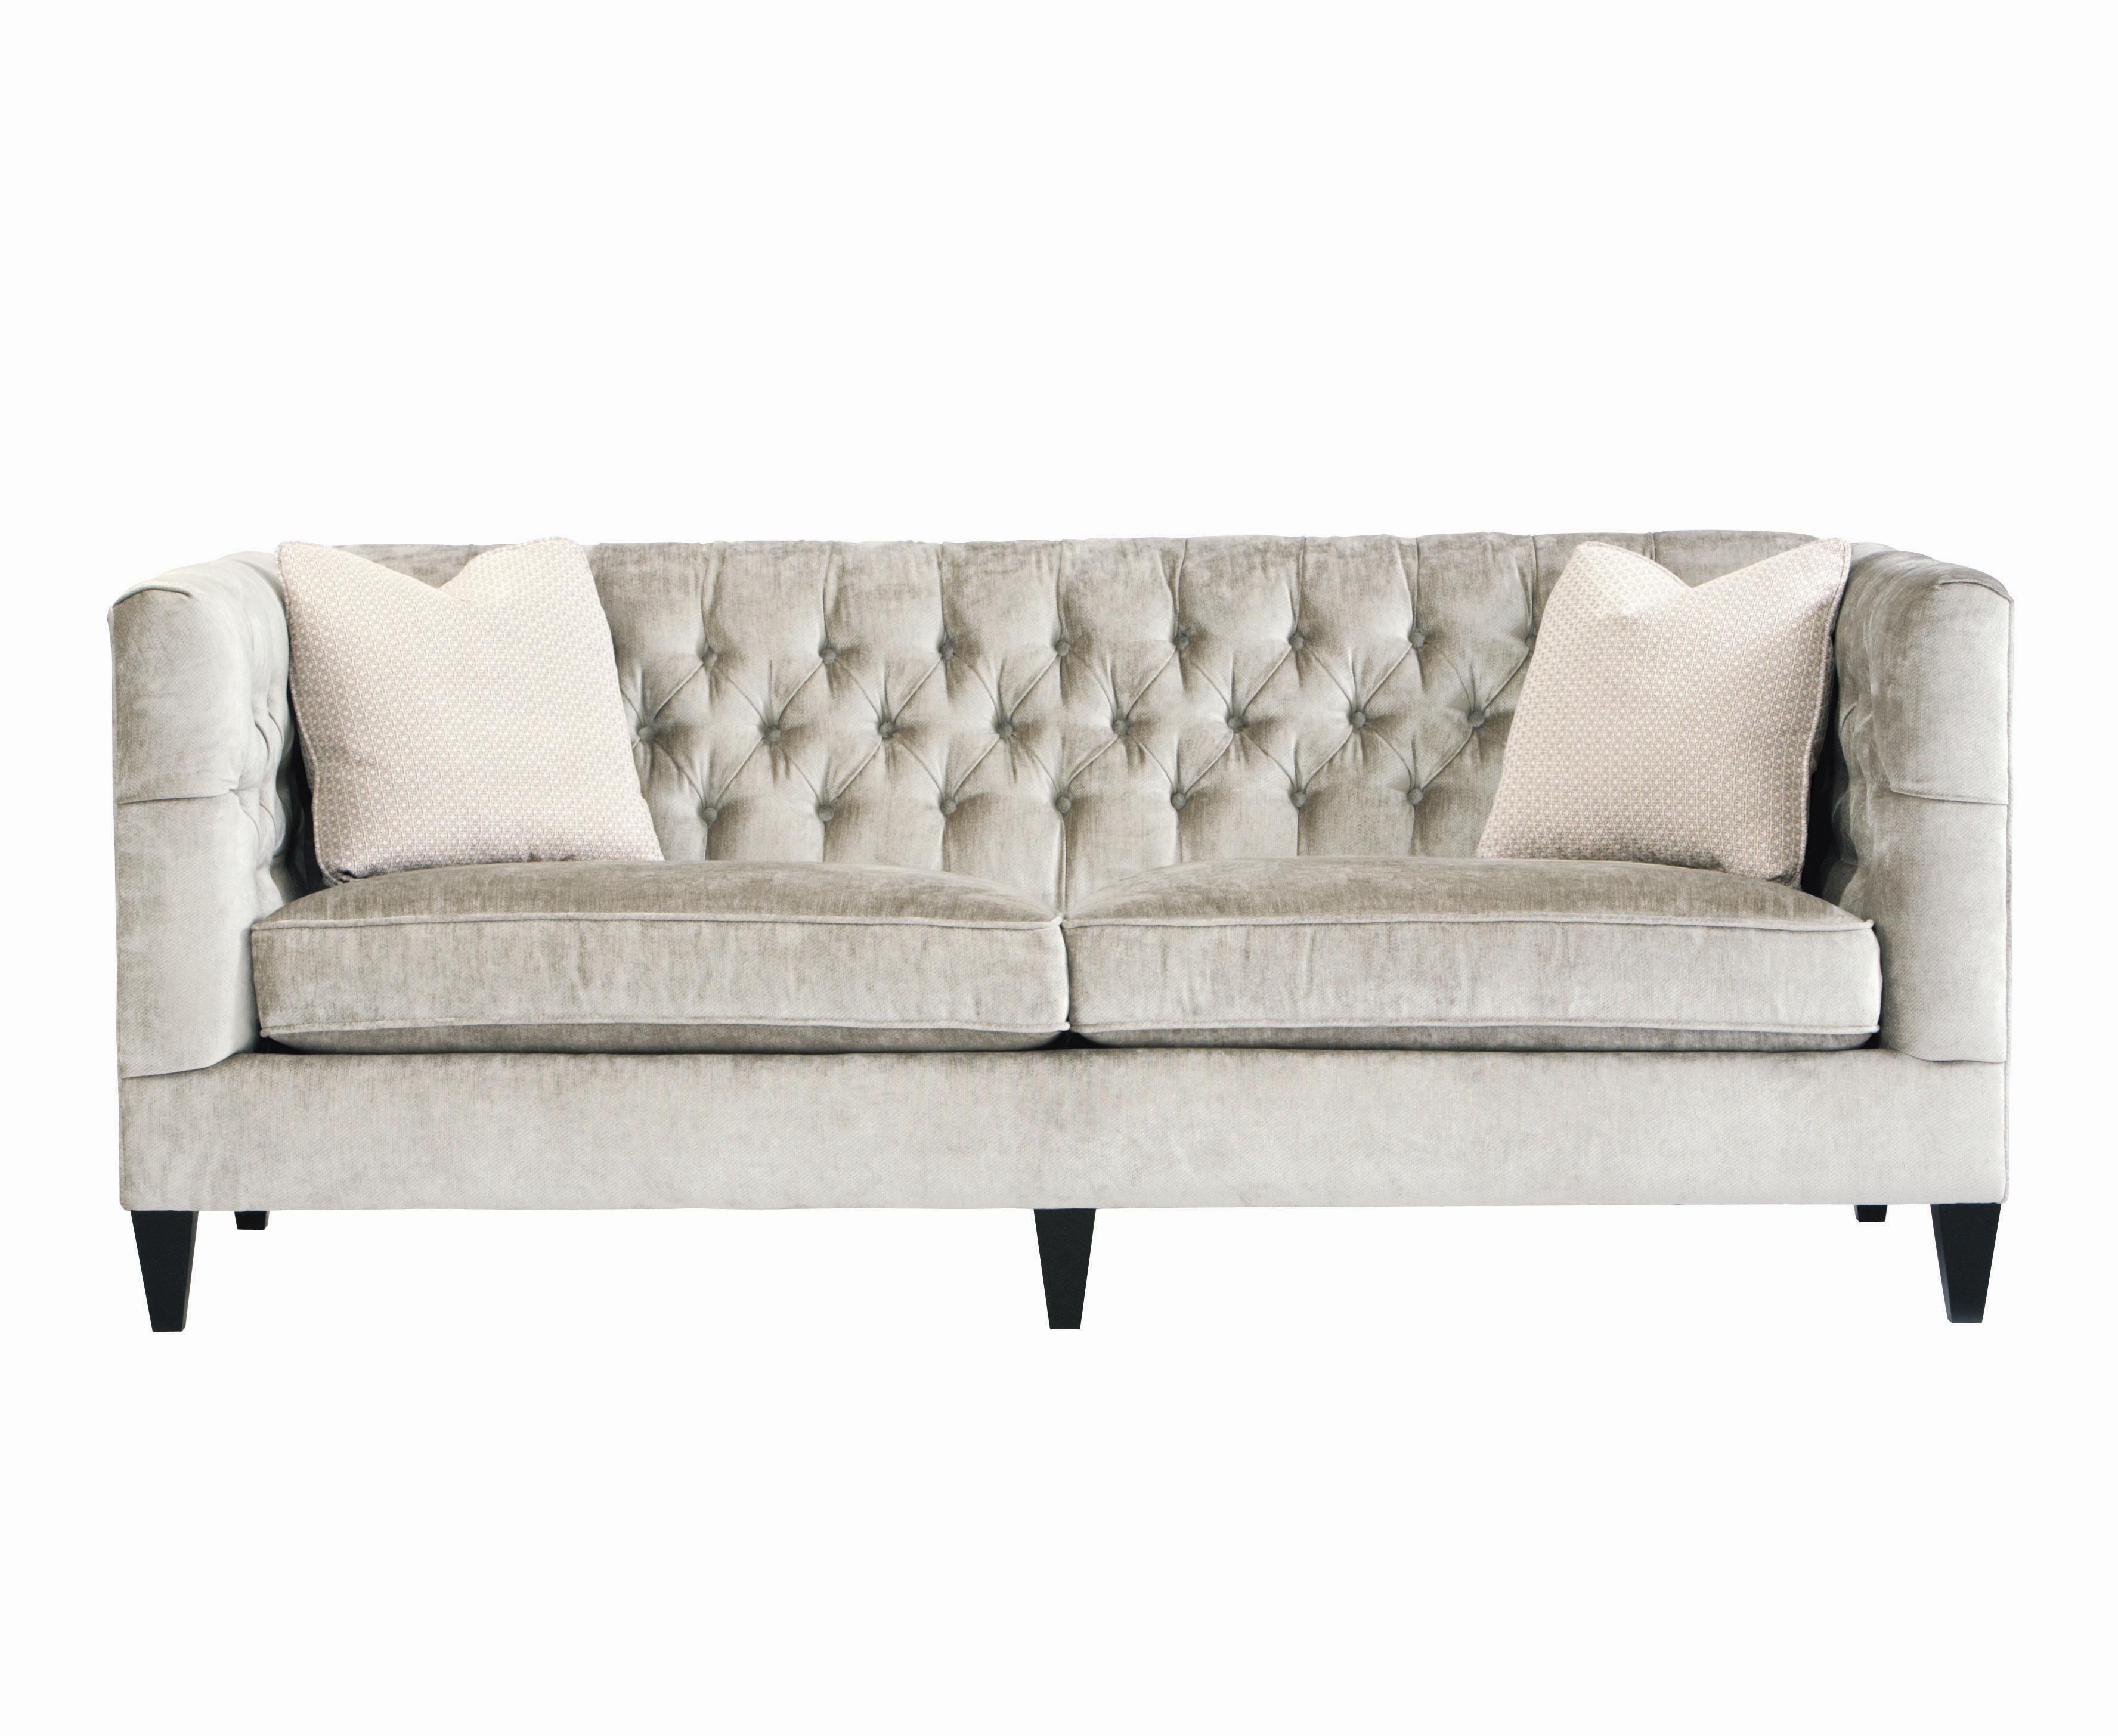 accent sofas sofa cloth dealers in hyderabad bernhardt interiors beckett reeds